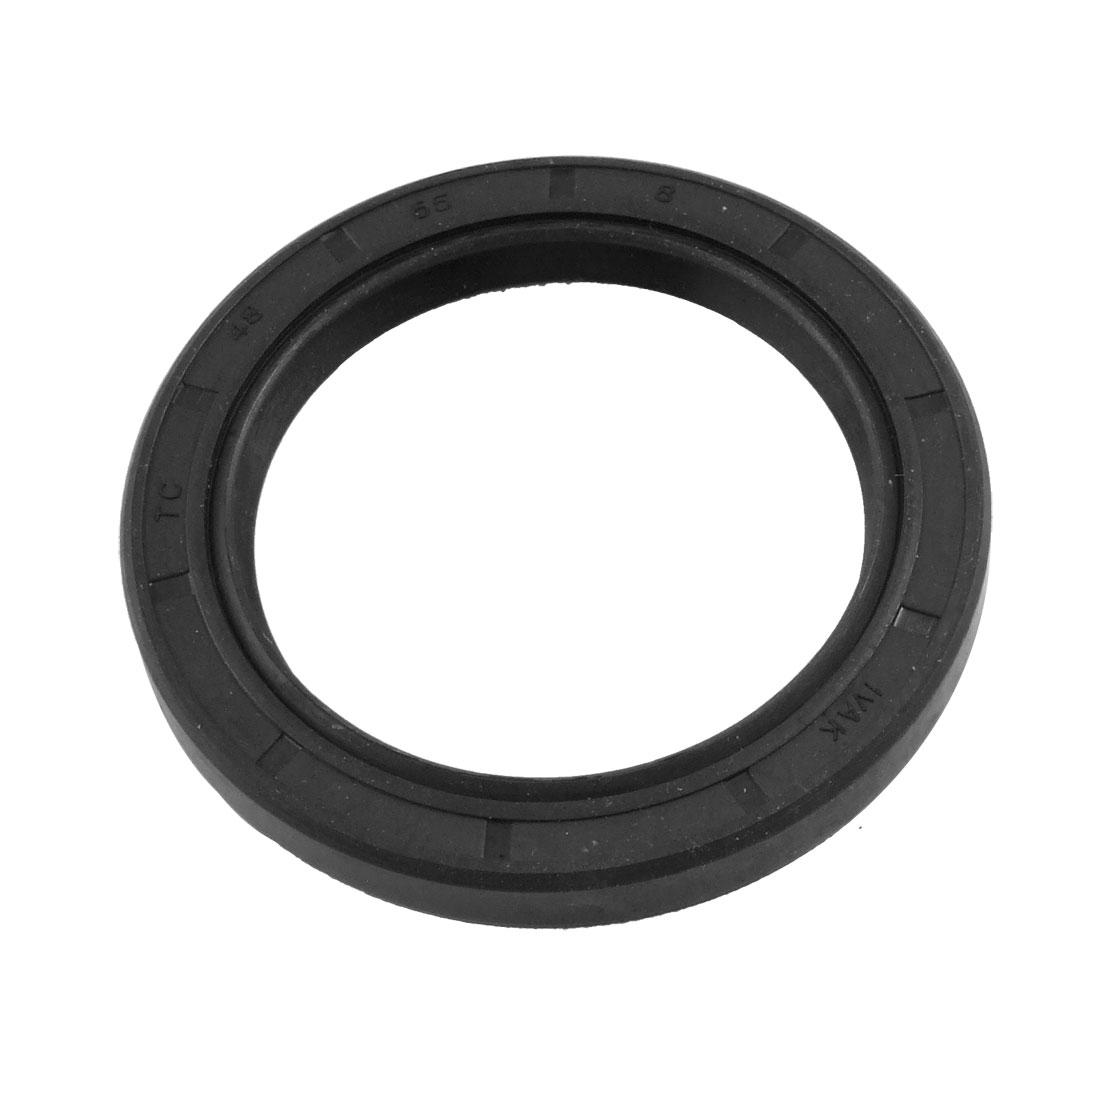 48mm x 65mm x 8mm Metric Double Lipped Rotary Shaft Oil Seal TC